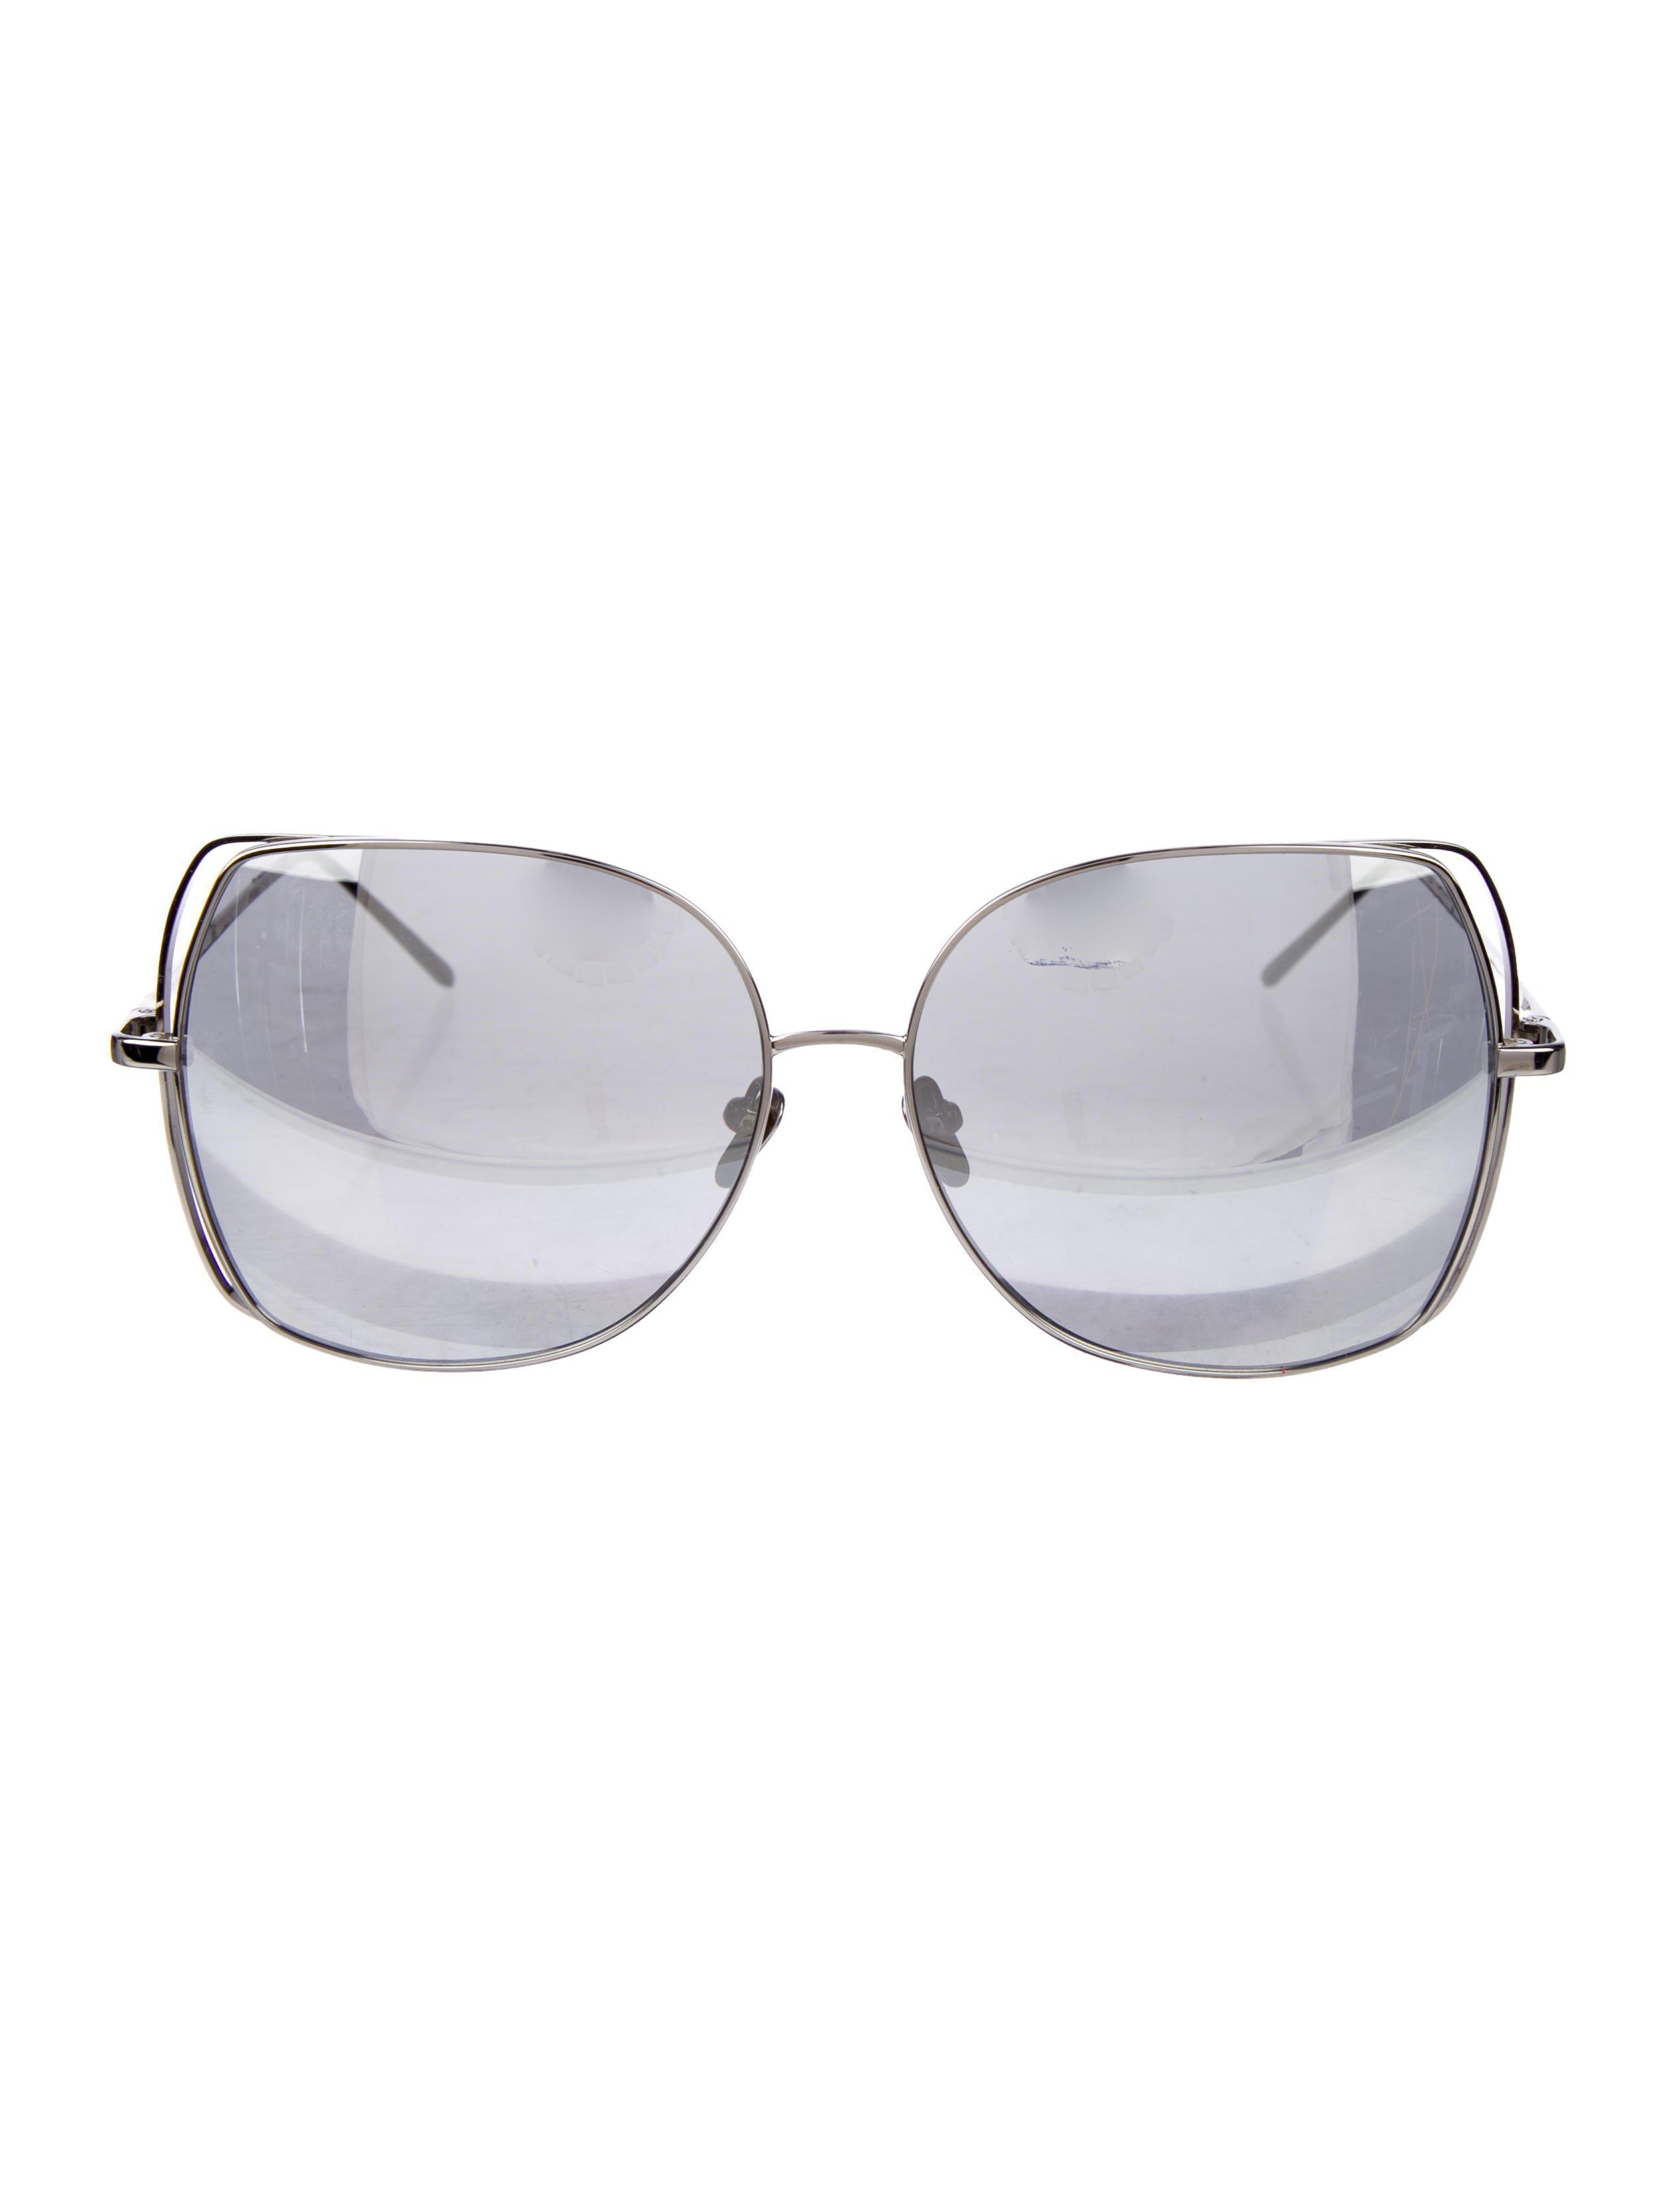 500047d95c95 Lyst - Linda Farrow White Gold-plated Sunglasses in Metallic